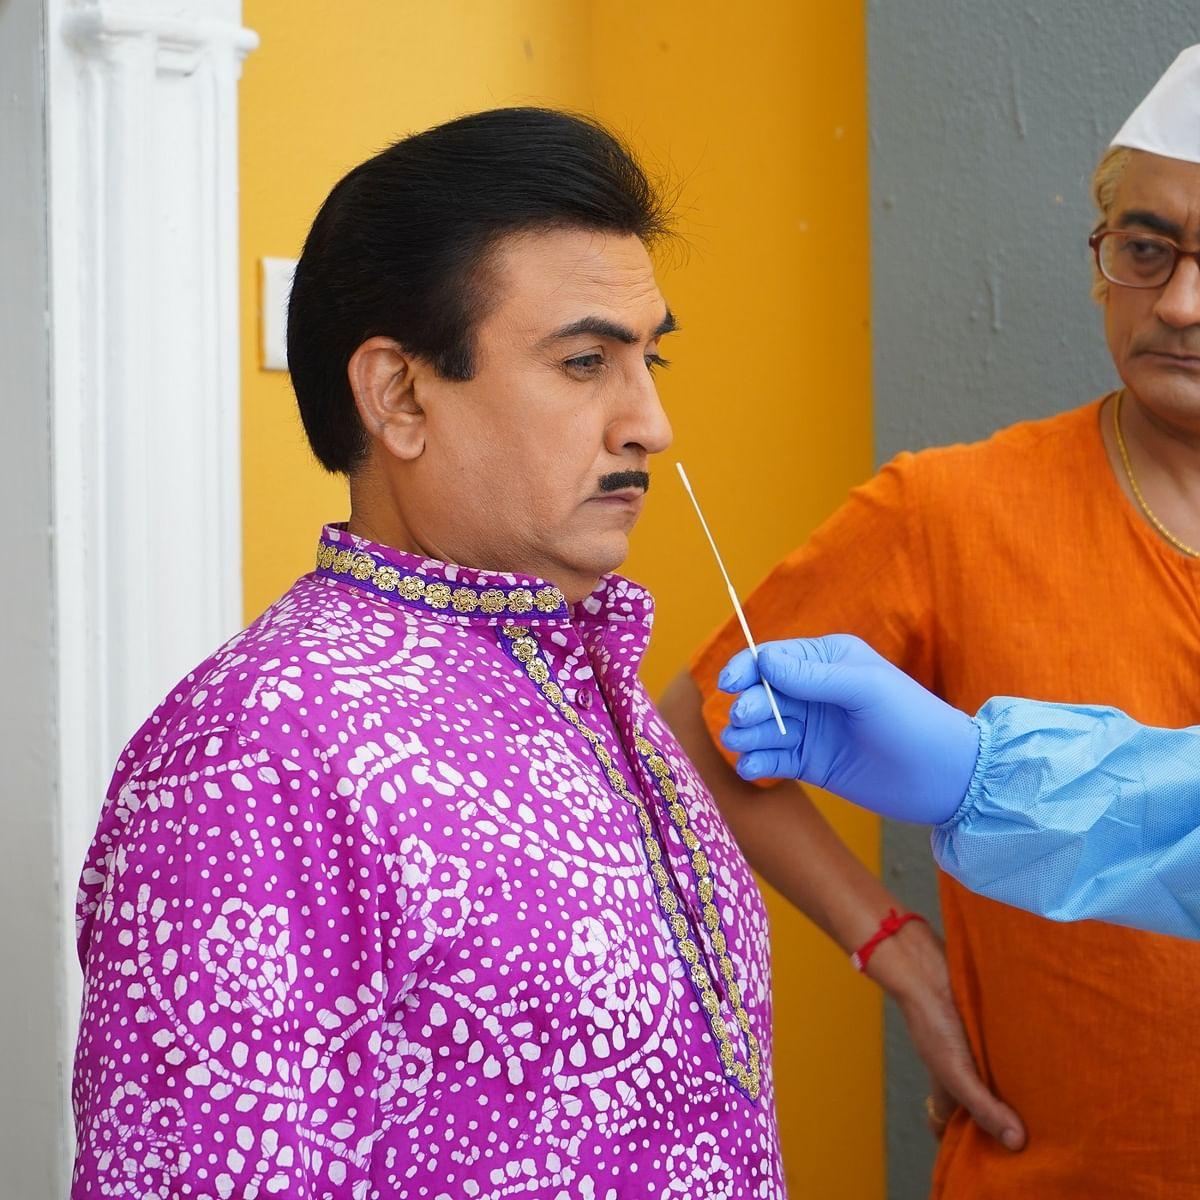 Taarak Mehta Ka Ooltah Chashmah: Gokuldhaam Society's residents undergo COVID-19 tests; see pics